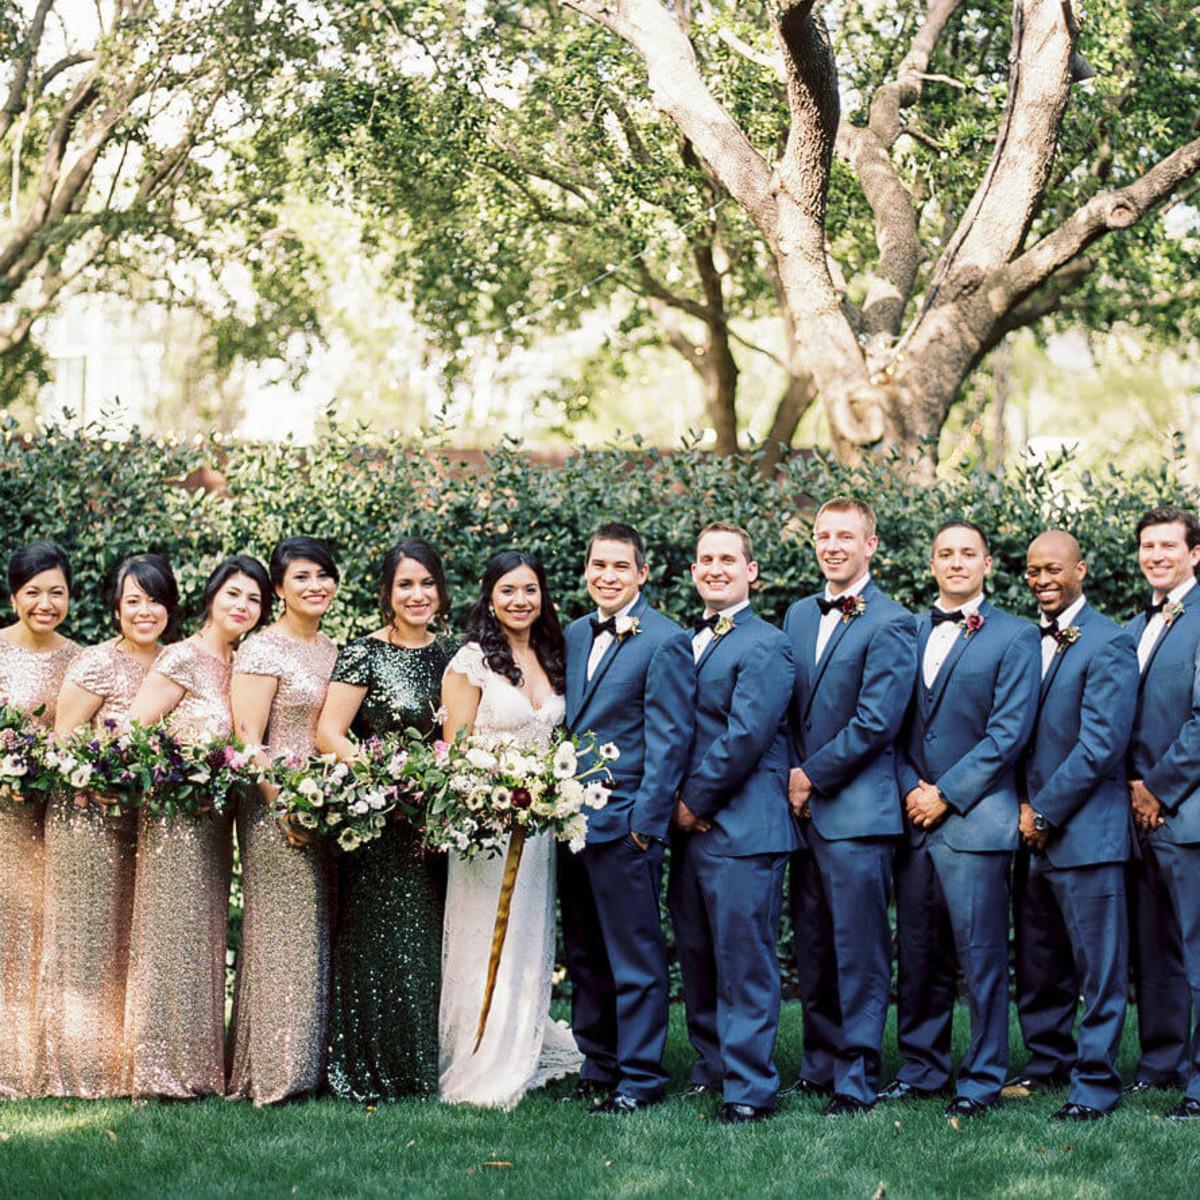 Jared + Diana bridal party